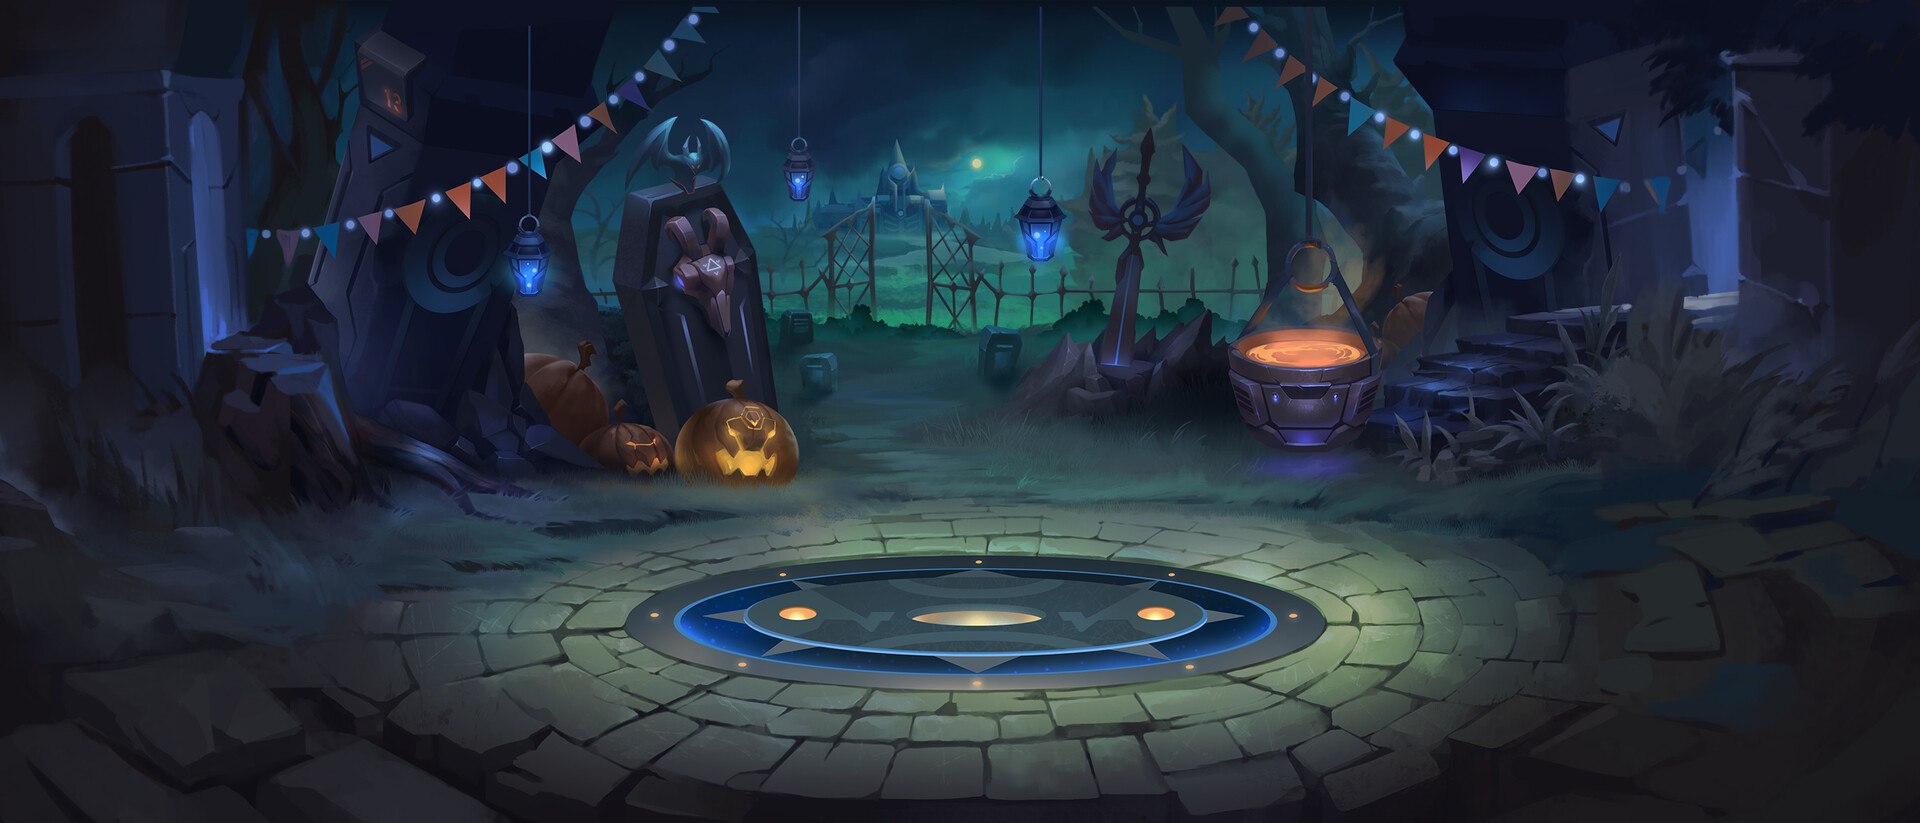 Trung nguyen bg halloween